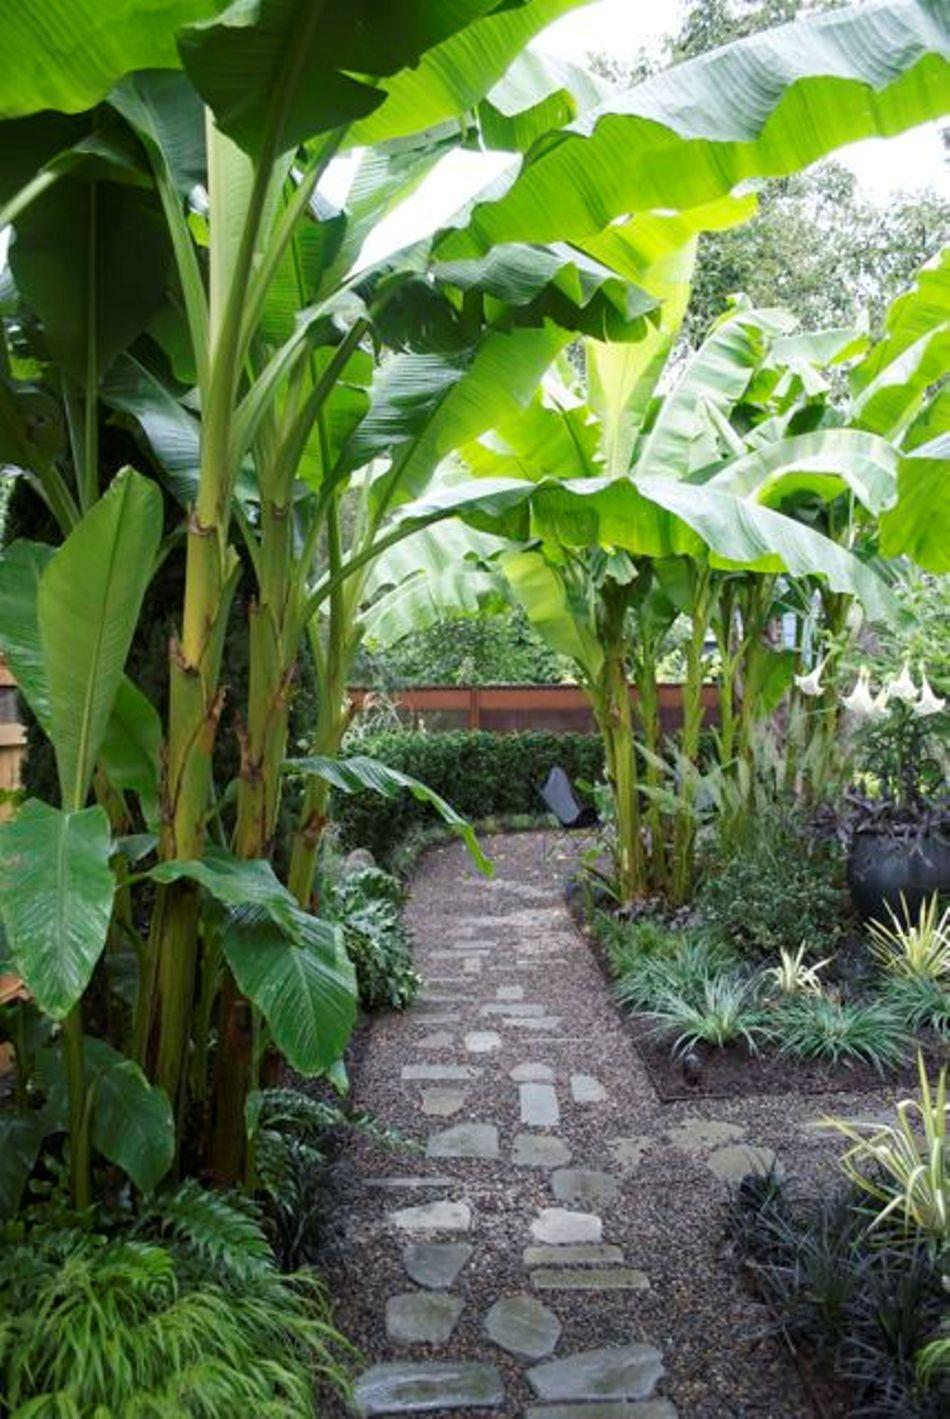 Growing Banana Trees In Your Yard Backyard Landscaping